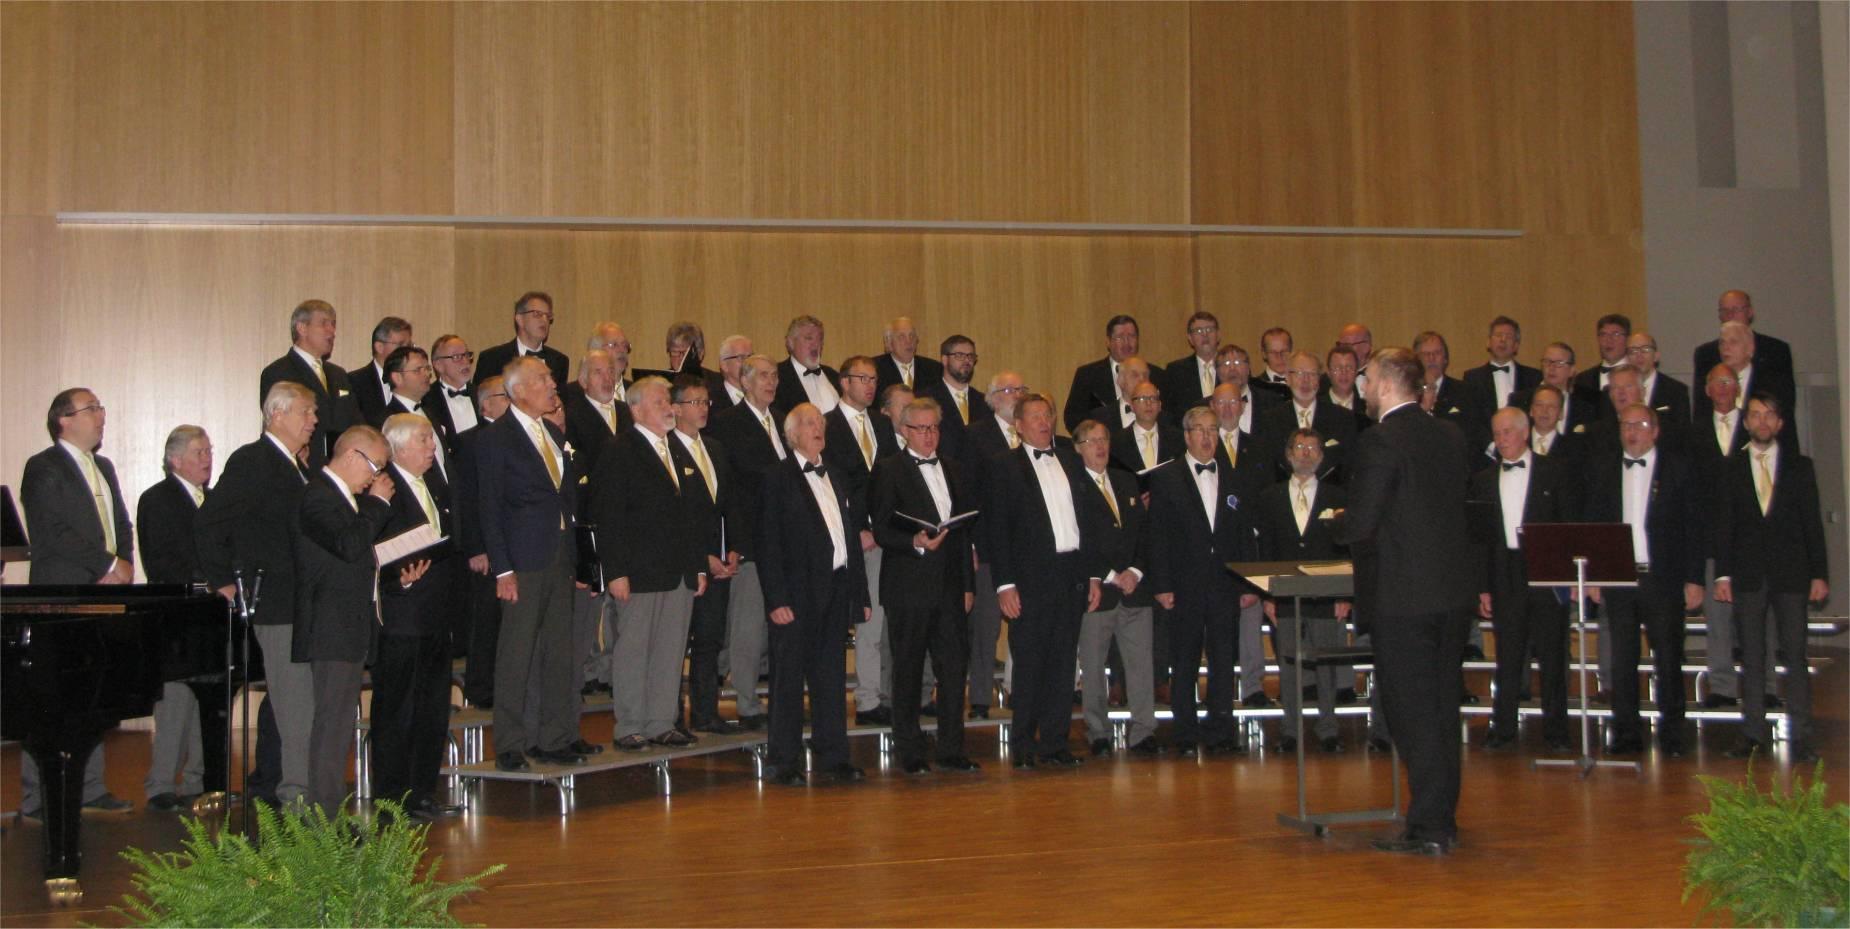 Seniorikonsertti Schaumansalissa v. 2017